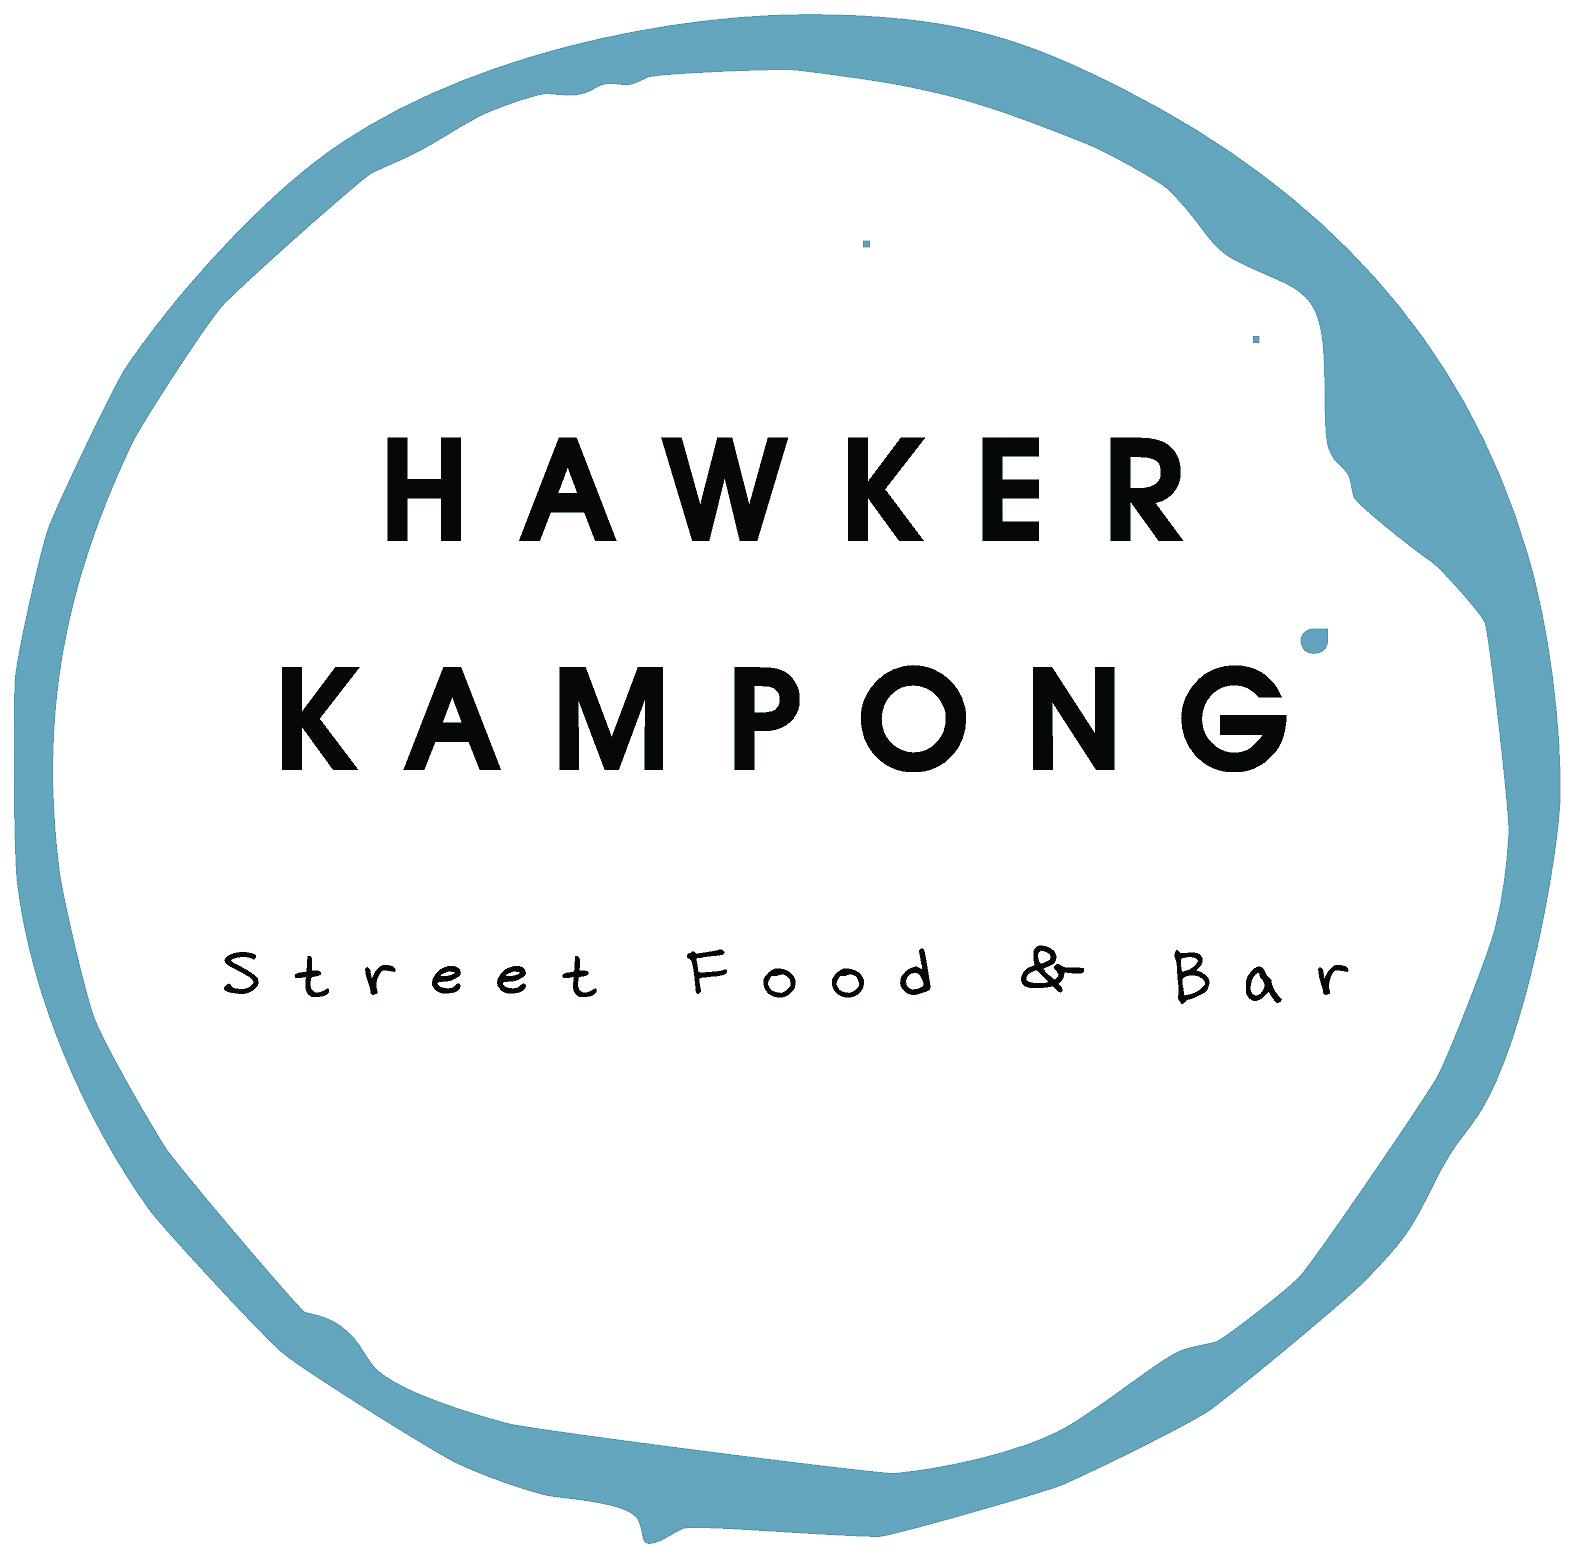 Hawker Kampong